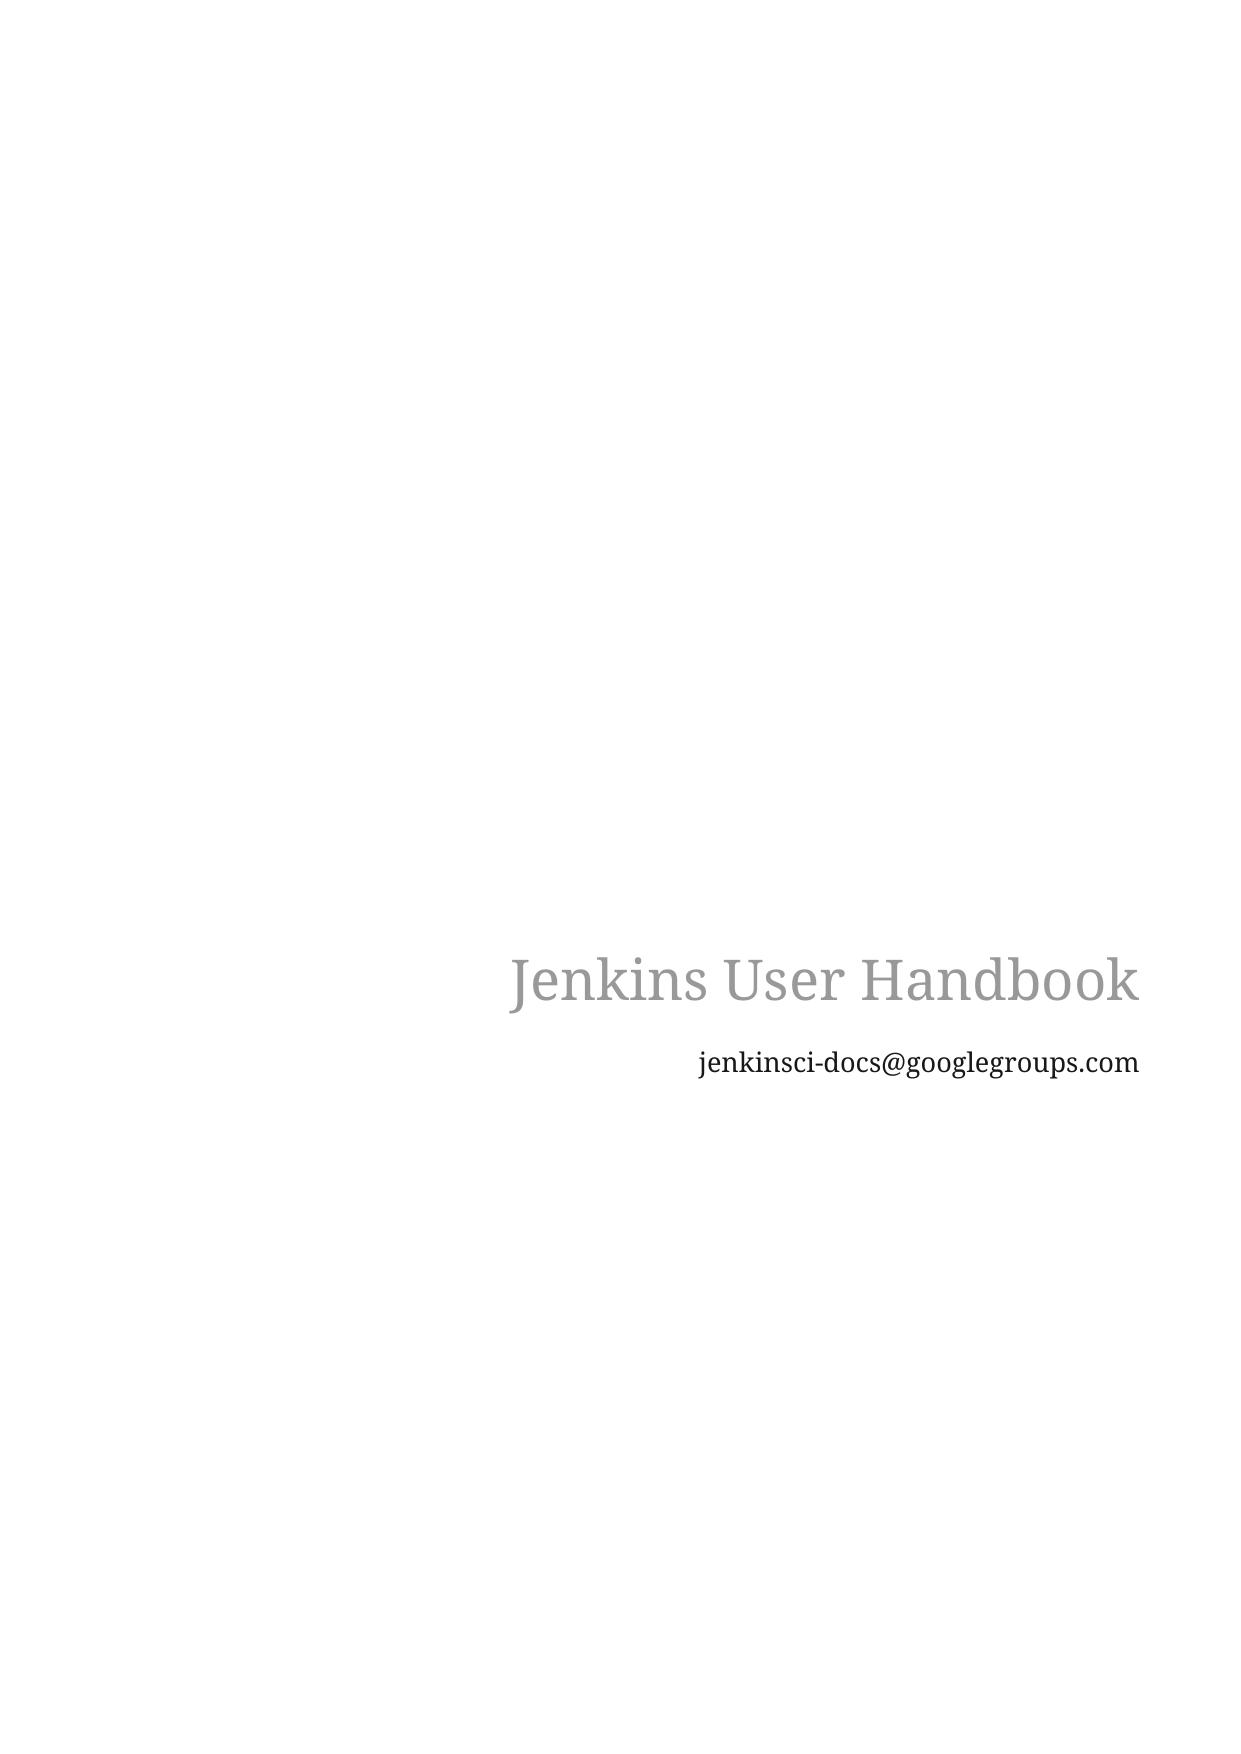 Jenkins User Handbook | manualzz com